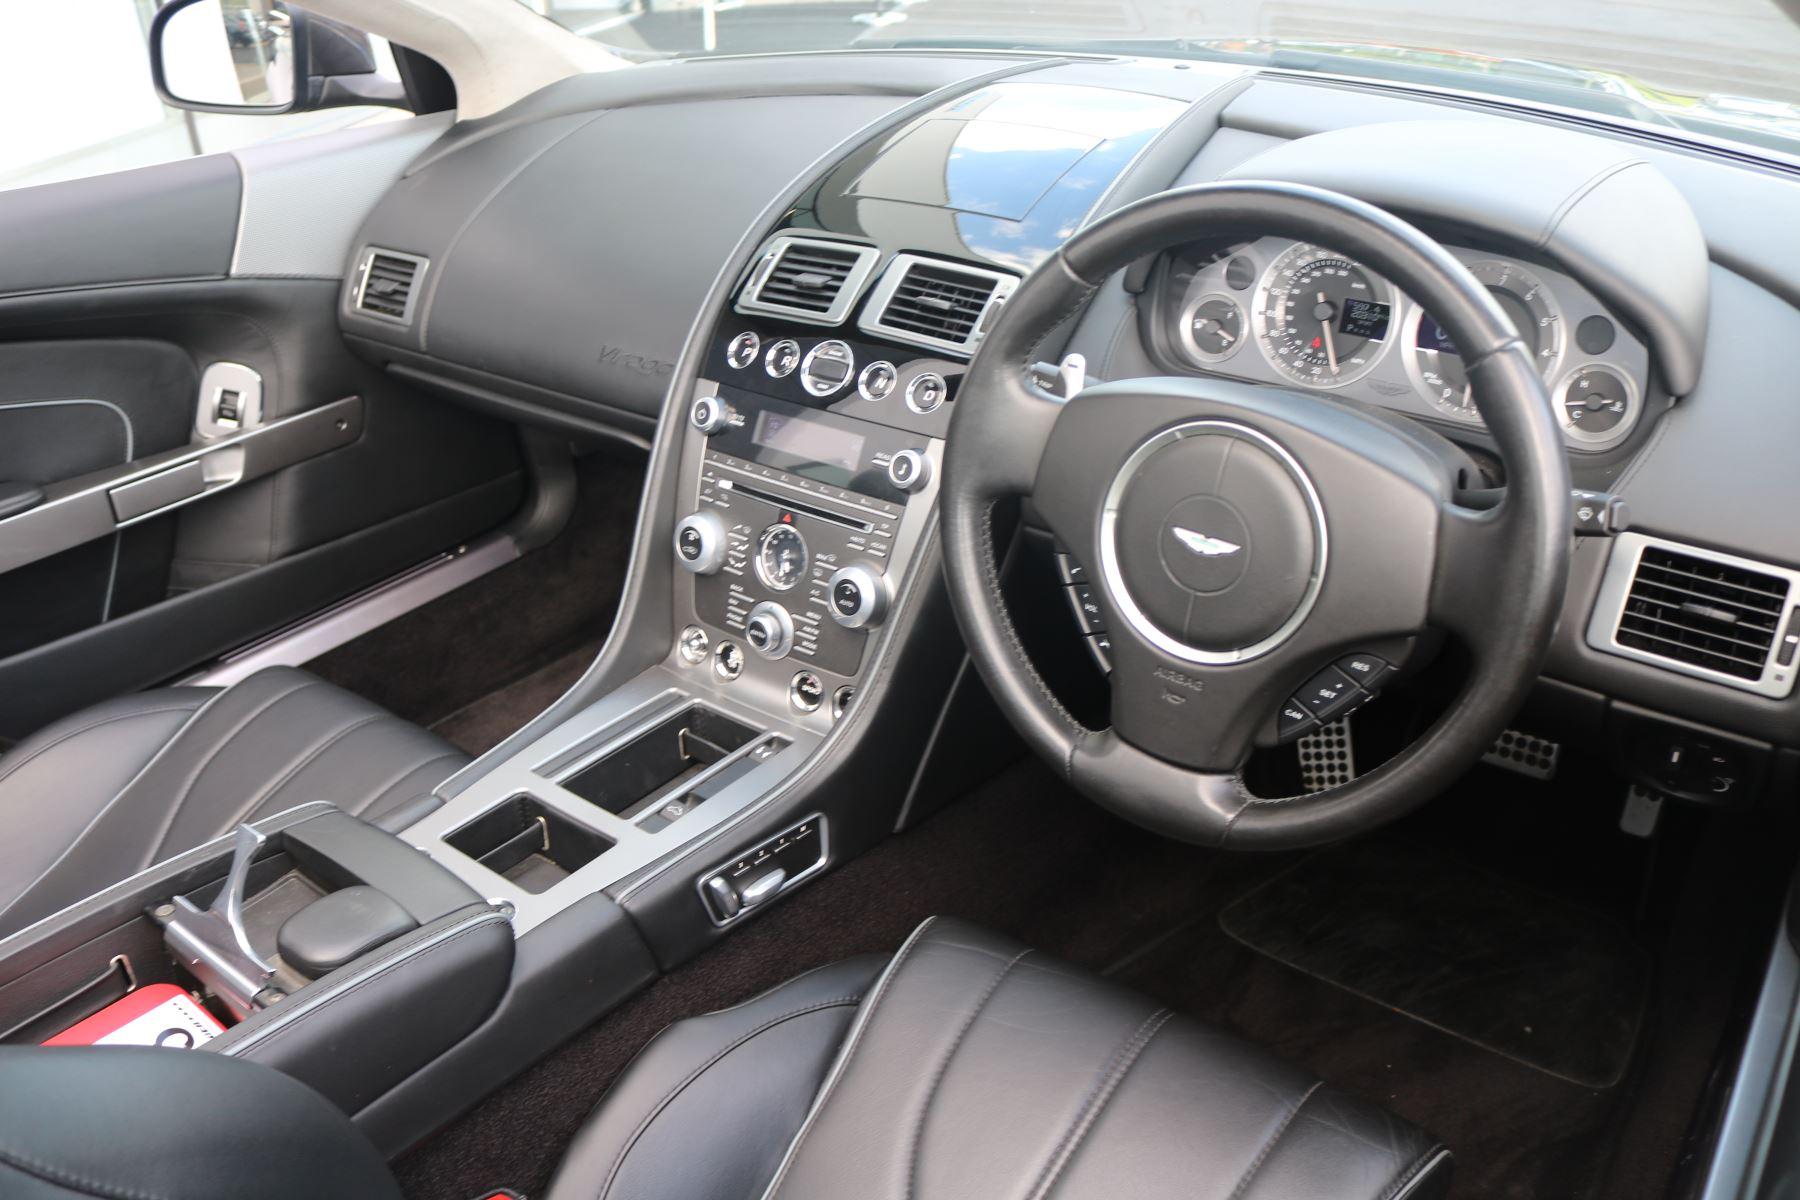 Aston Martin Virage V12 2dr Volante Touchtronic image 15